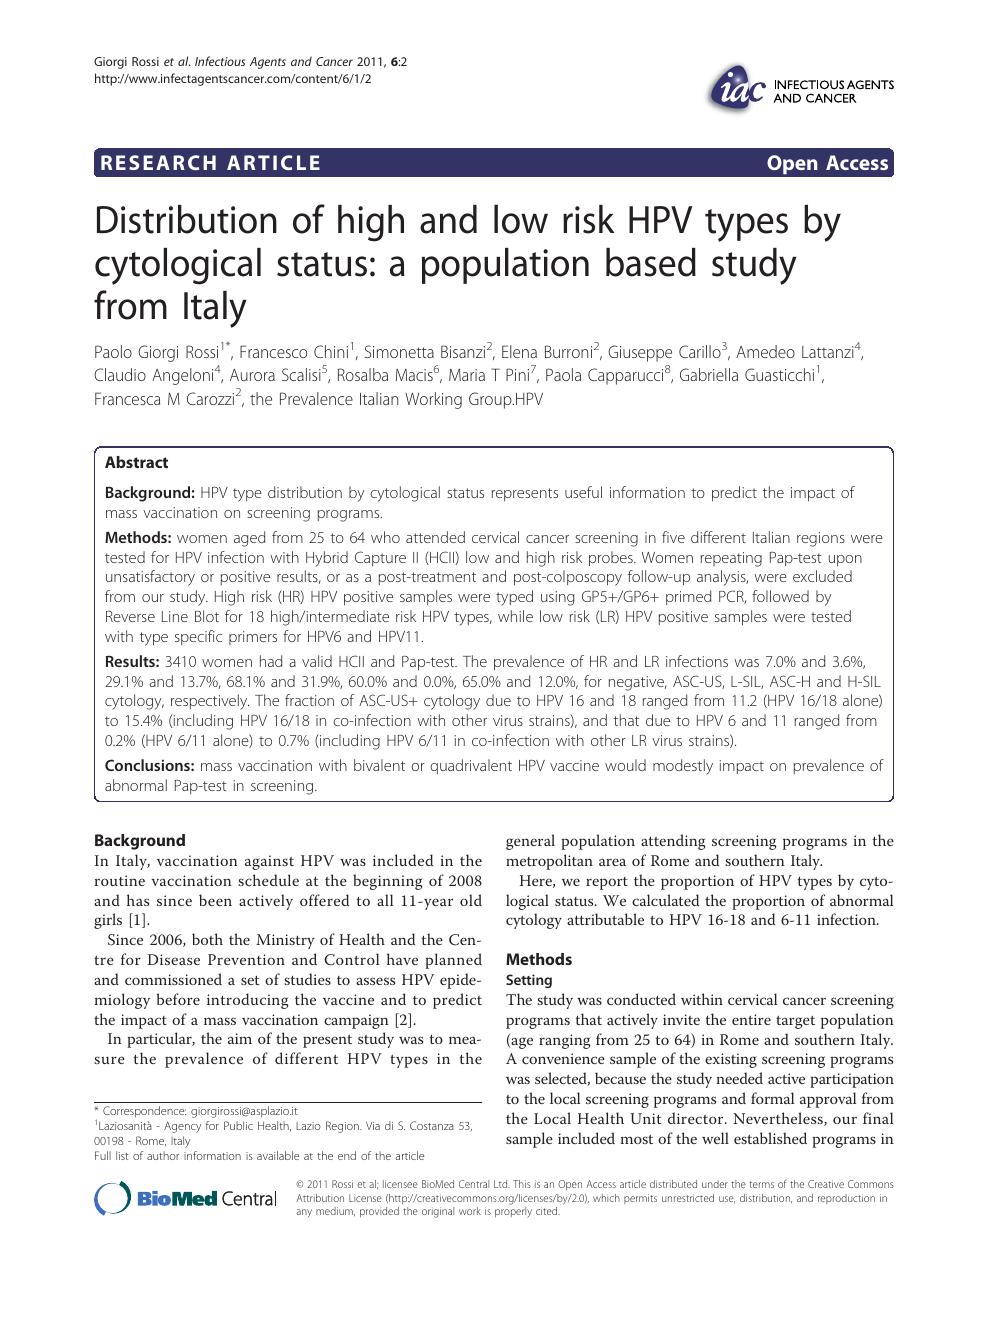 hpv high risk la gi